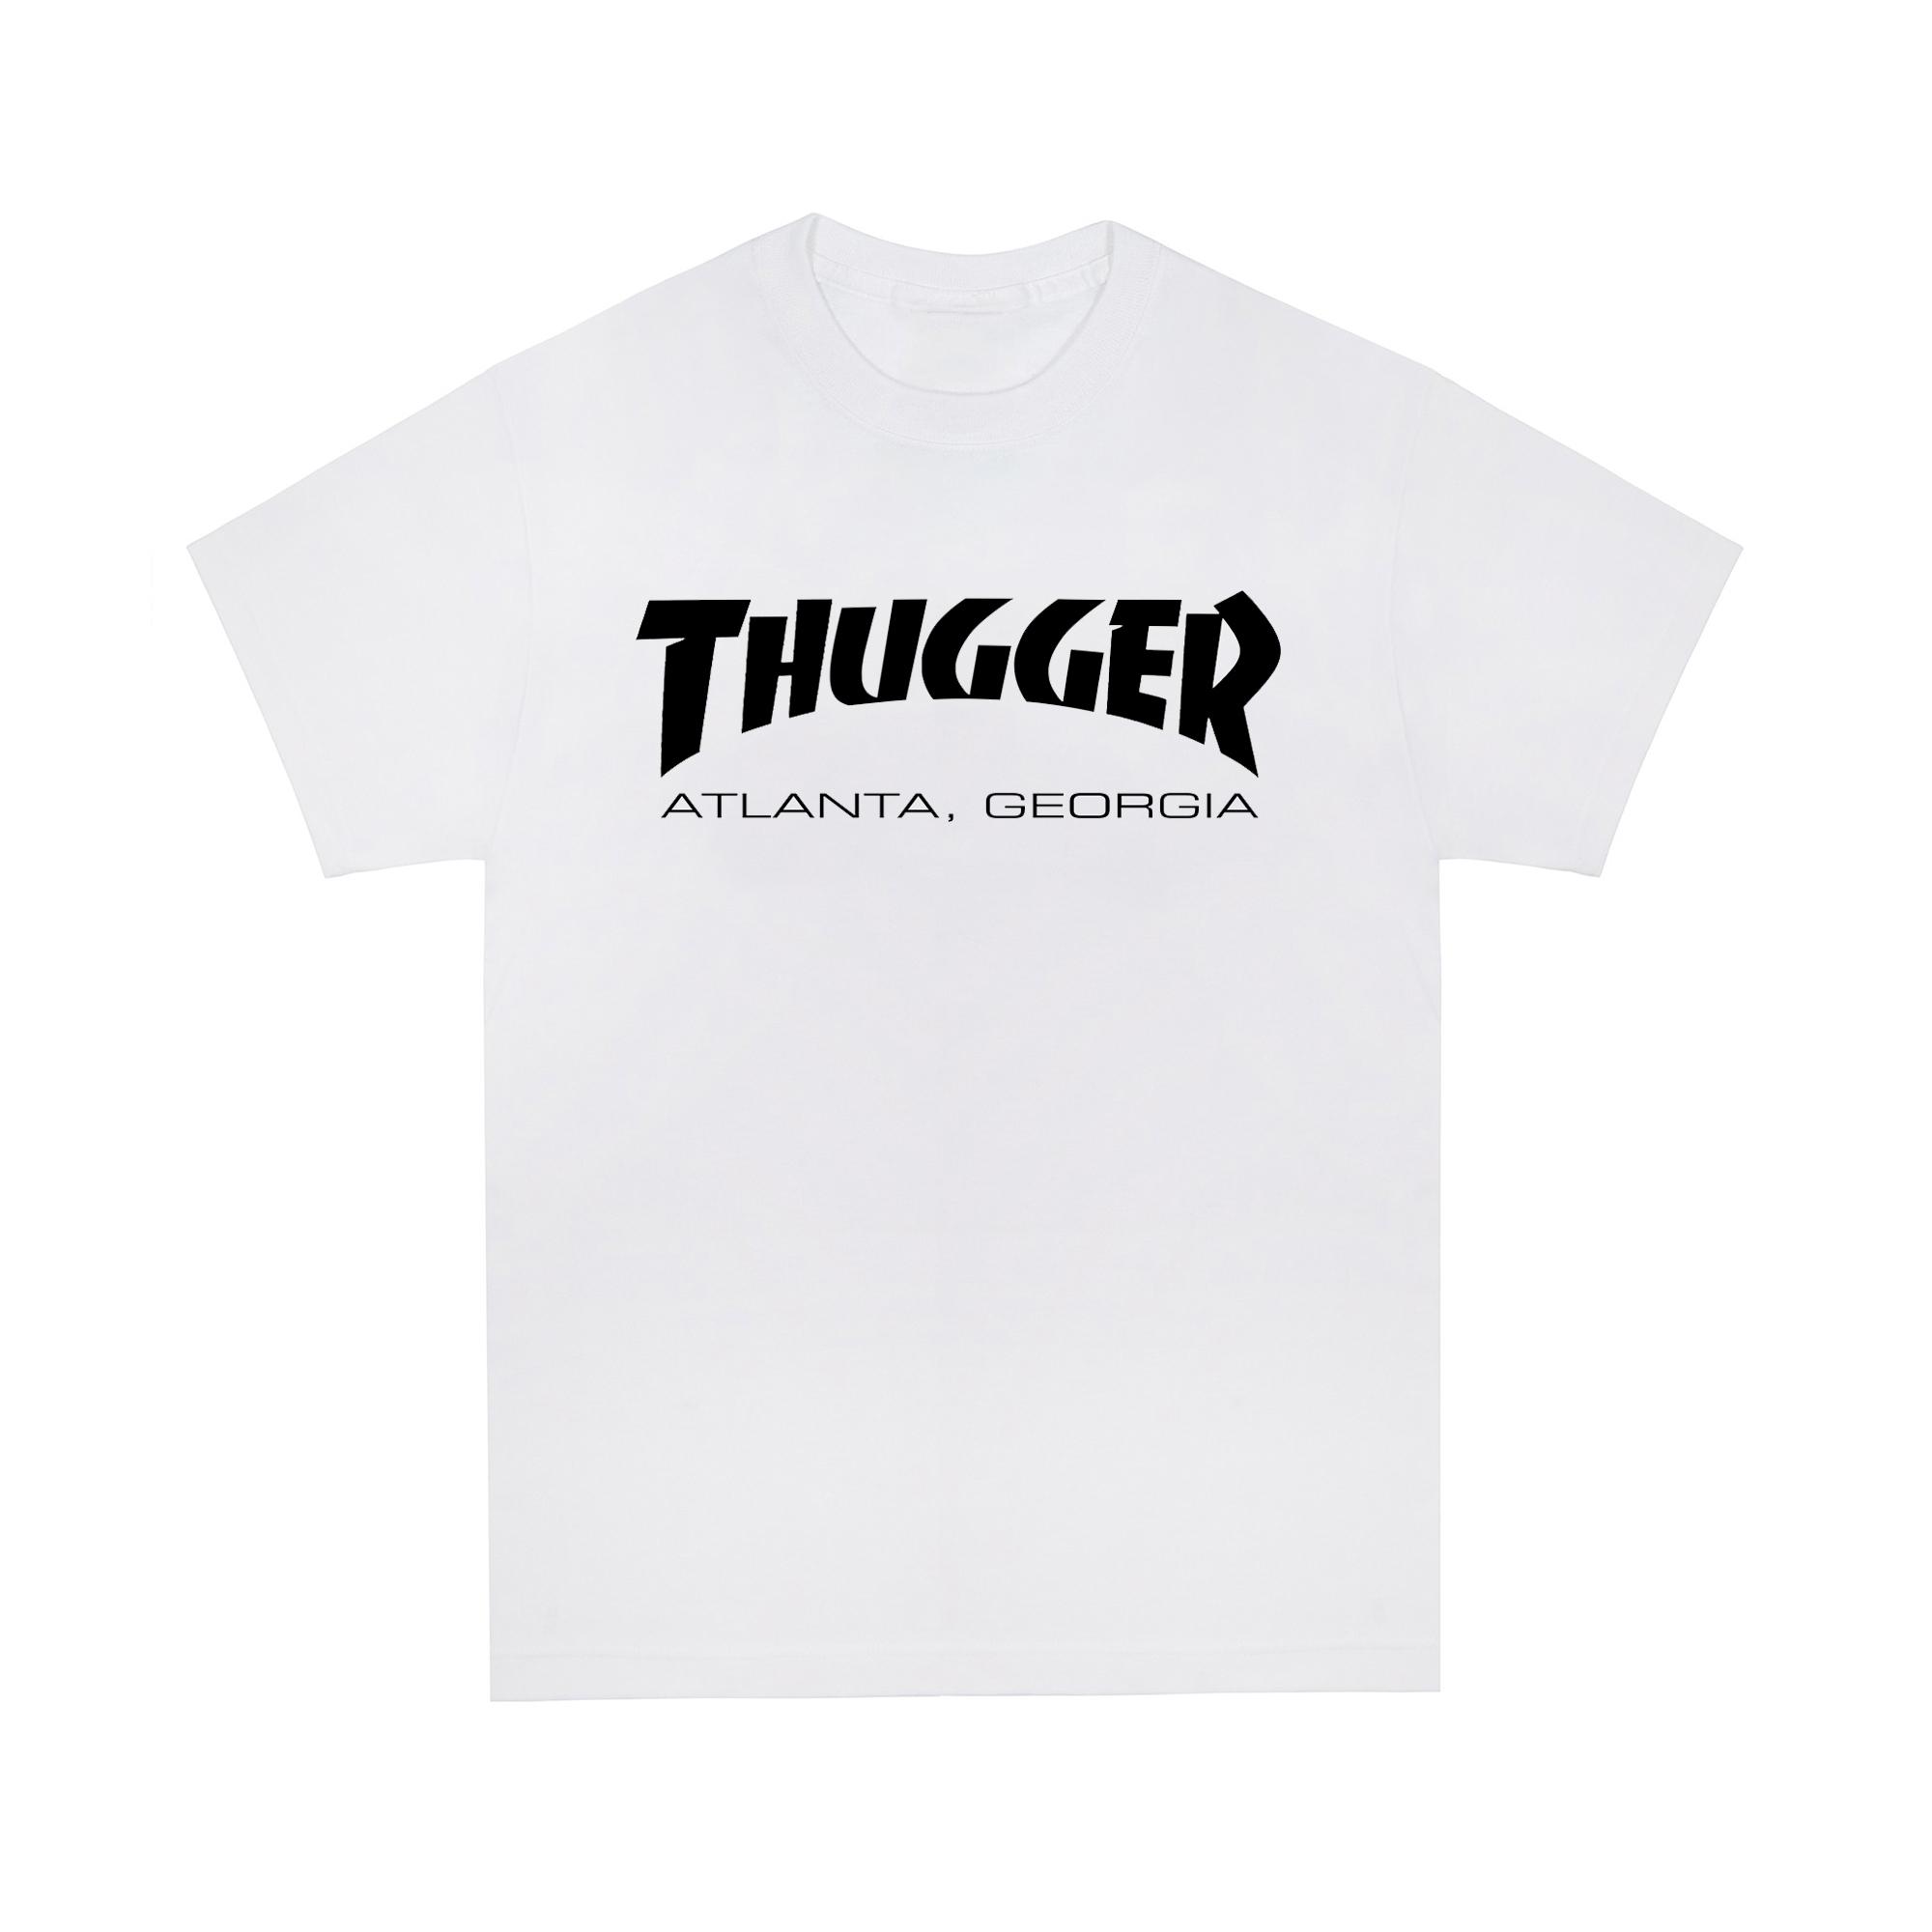 thugger.jpg